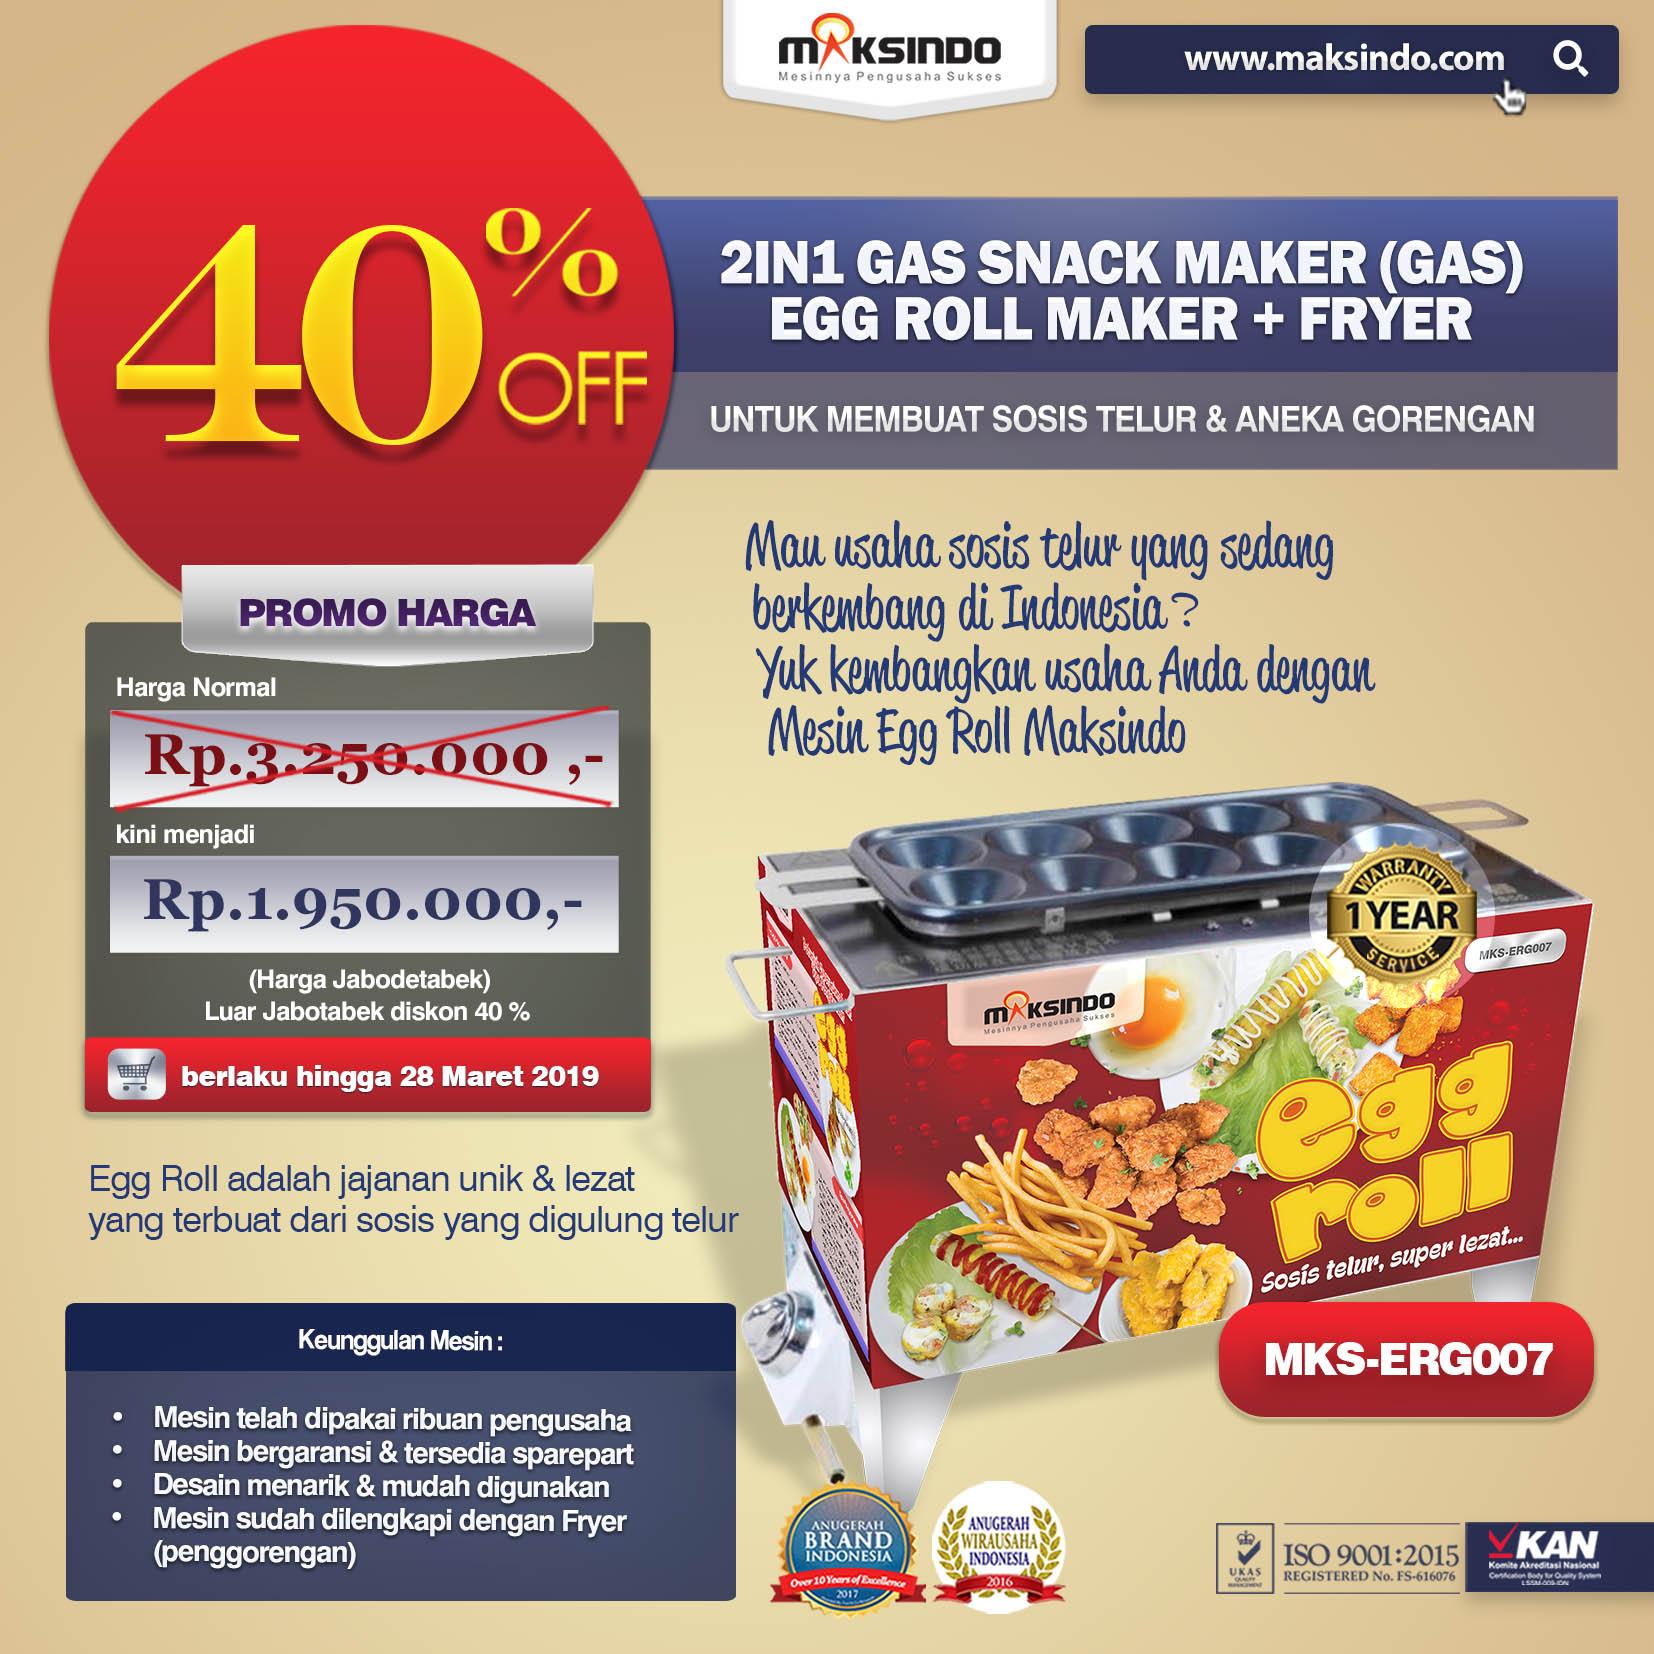 MKS ERG007 2in1 Gas Snack Maker (Gas) Egg Roll Maker + Fryer disc